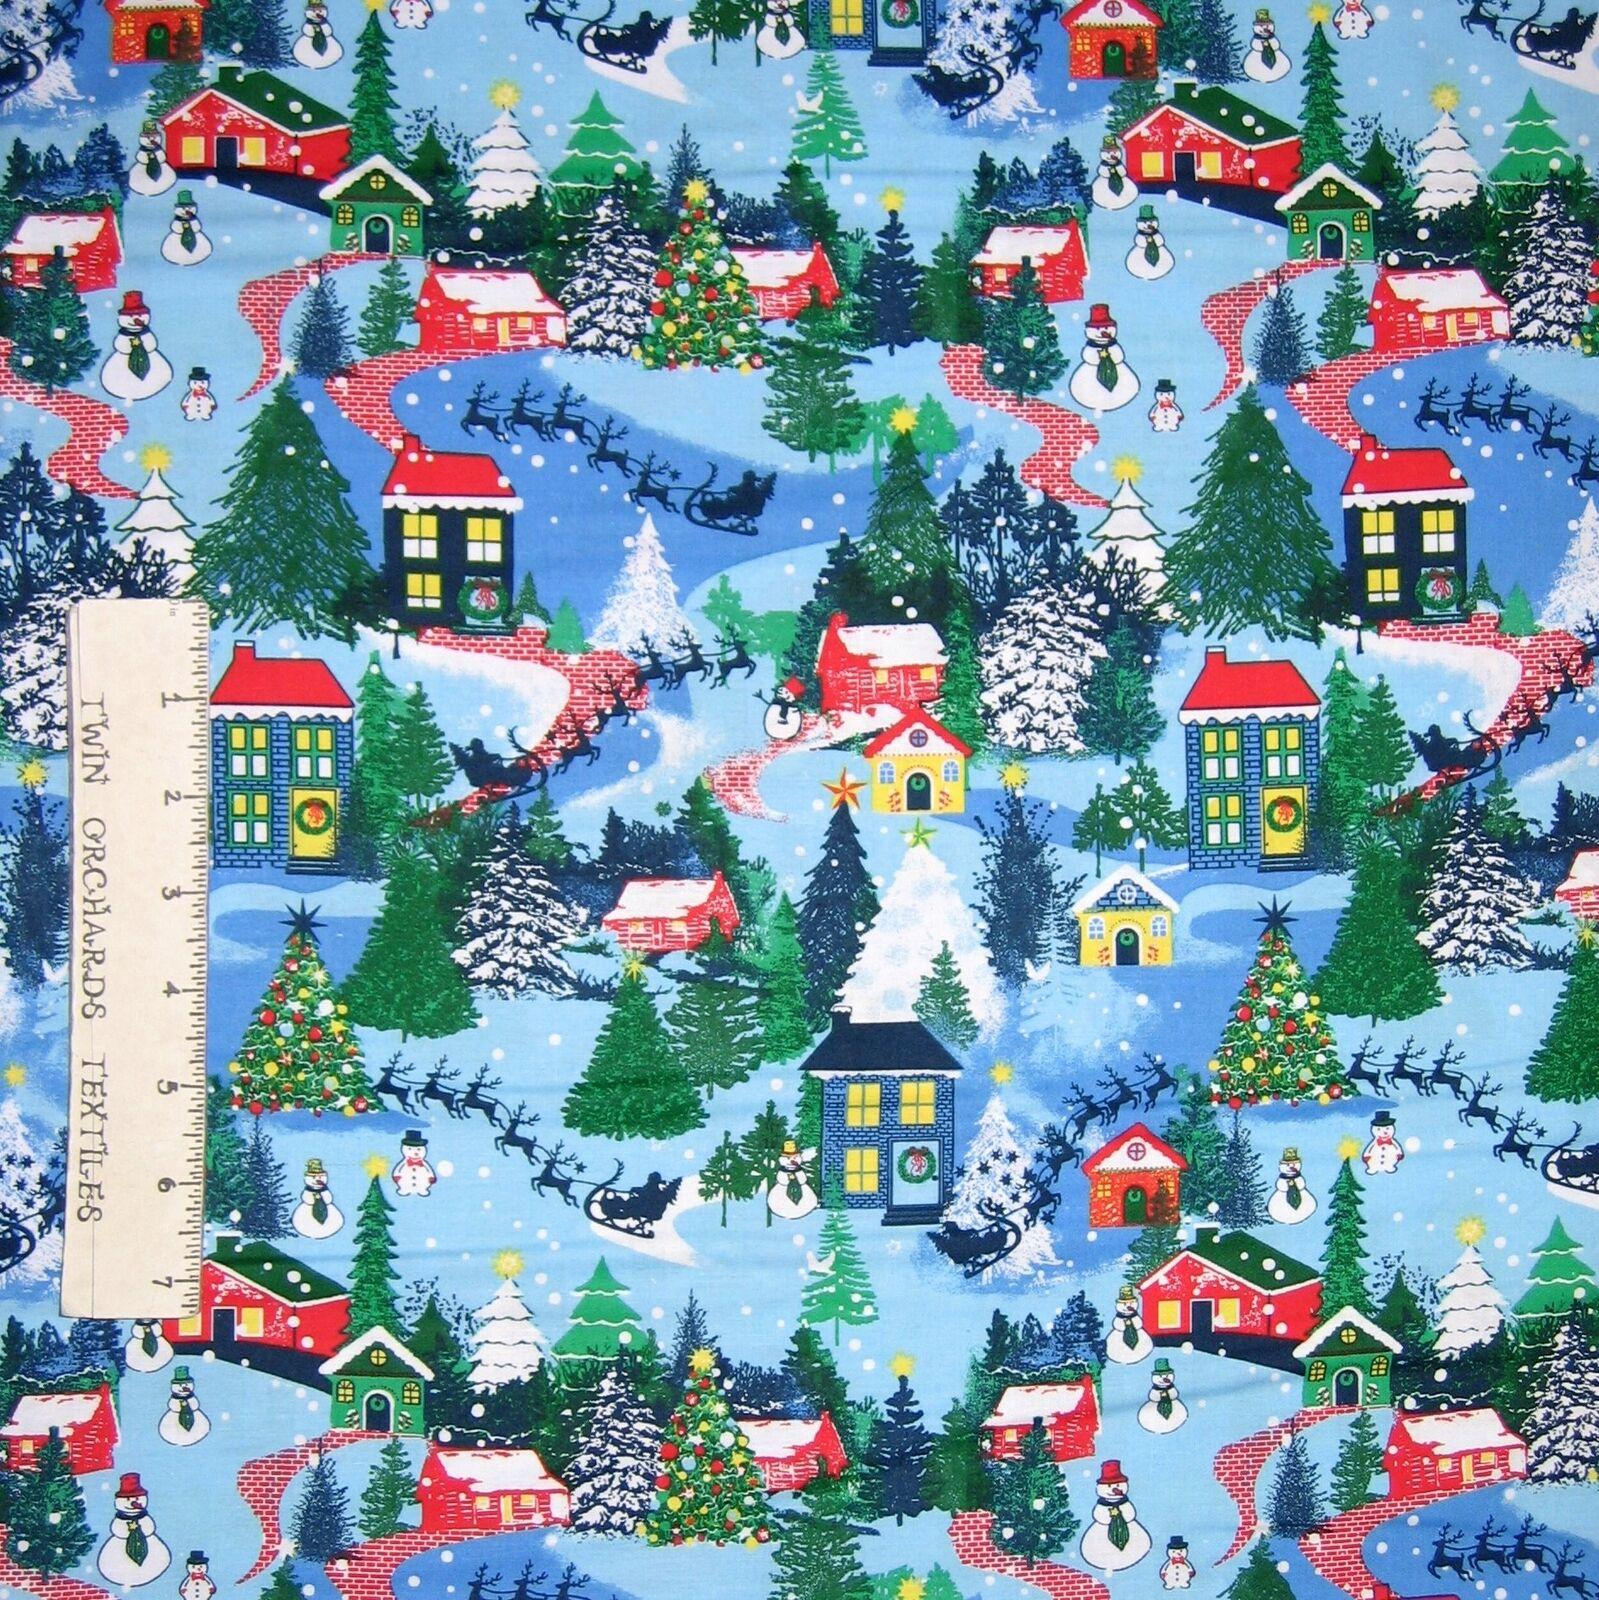 Christmas Fabric Snowman Snowflake Winter Snow Toss Blue QTSnow Daze Yard